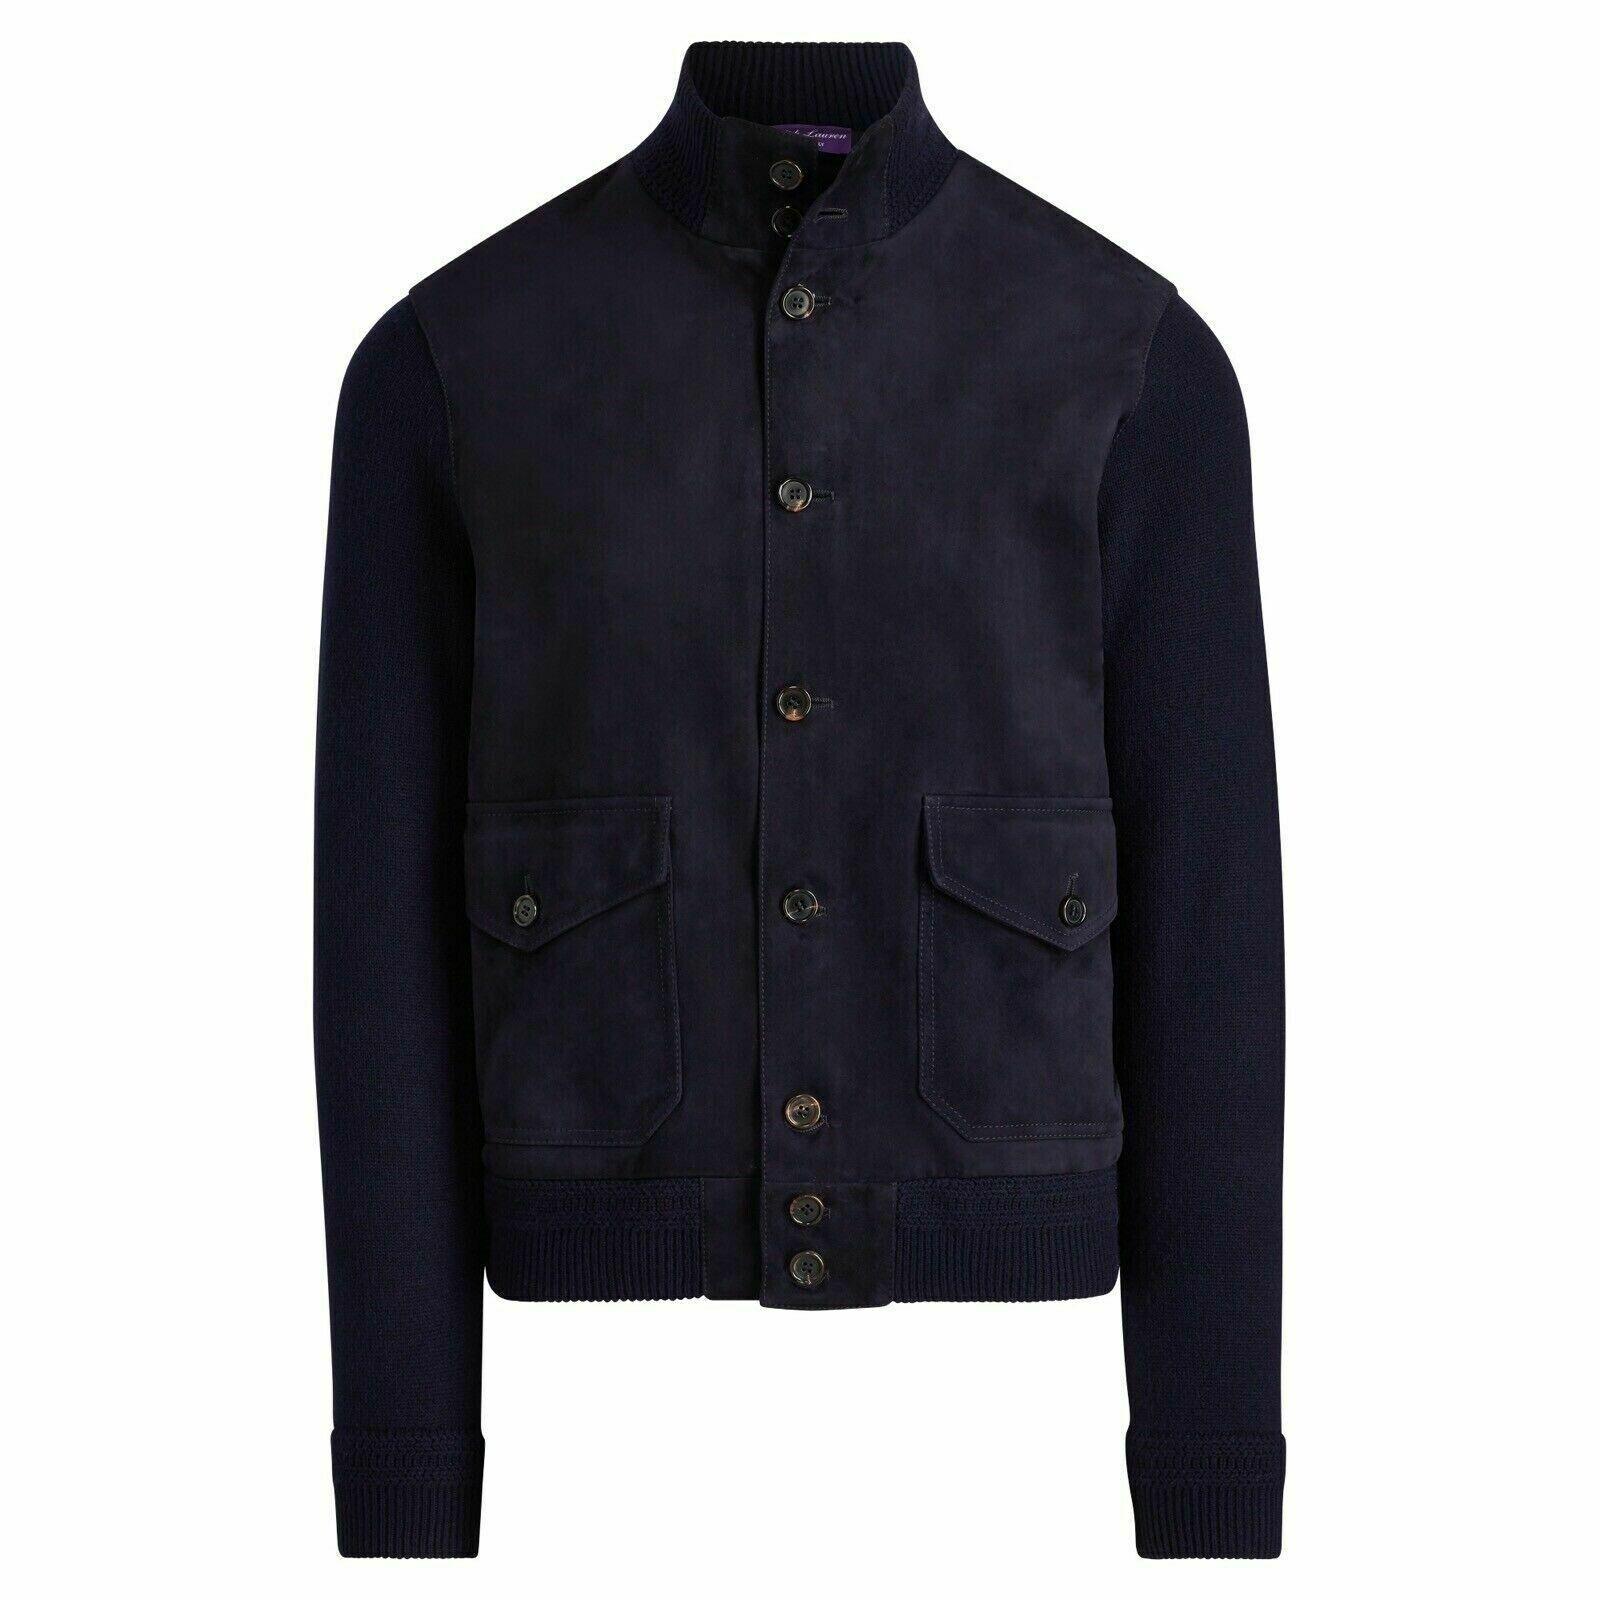 2995-ralph-lauren-purple-label-cashmere-suede-sweater-jacket-italy-navy-xl